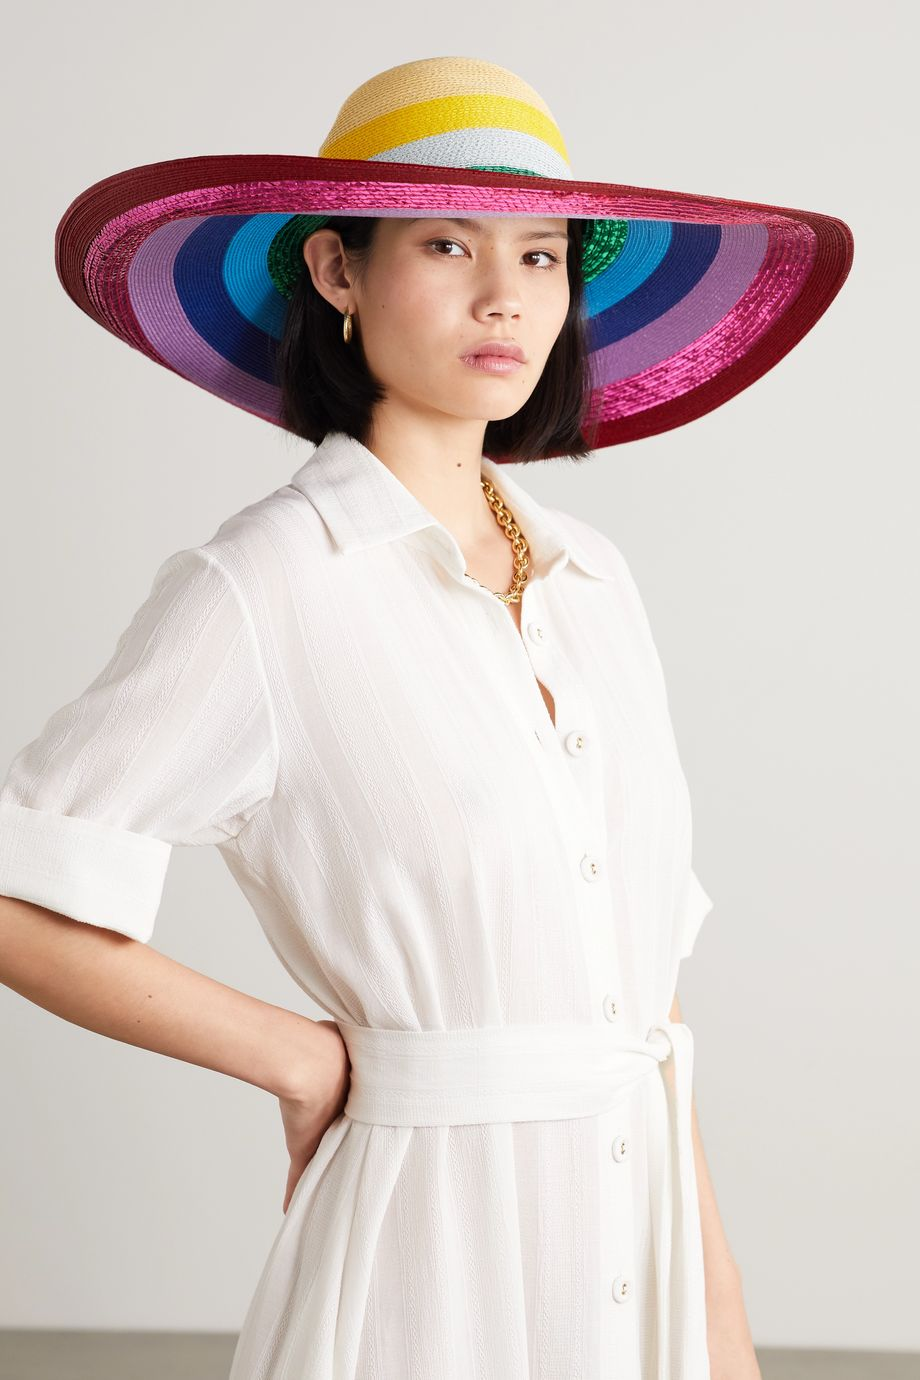 Mary Katrantzou MARY-MARE Riviera geflochtener Hut mit Streifen in Metallic-Optik